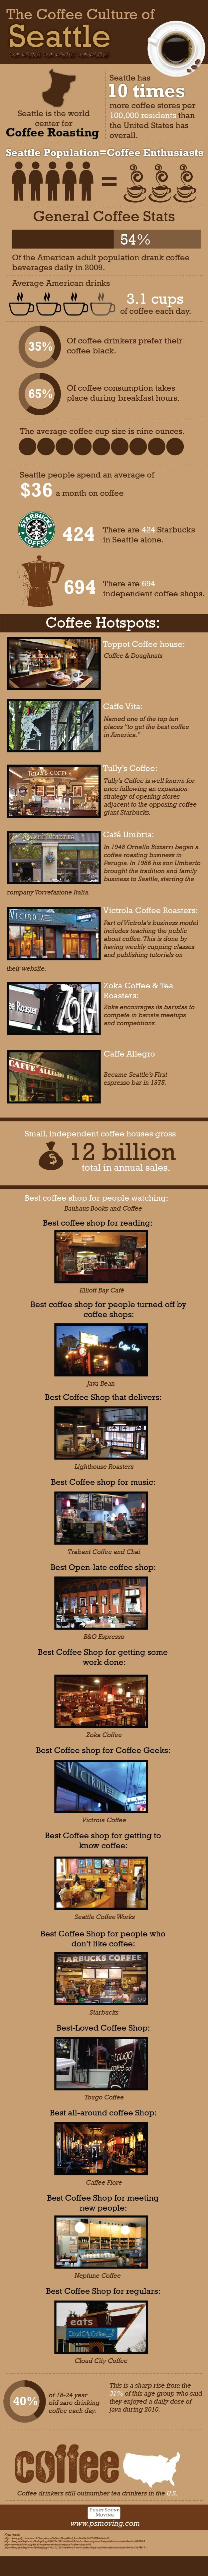 Seattle Coffee Culture